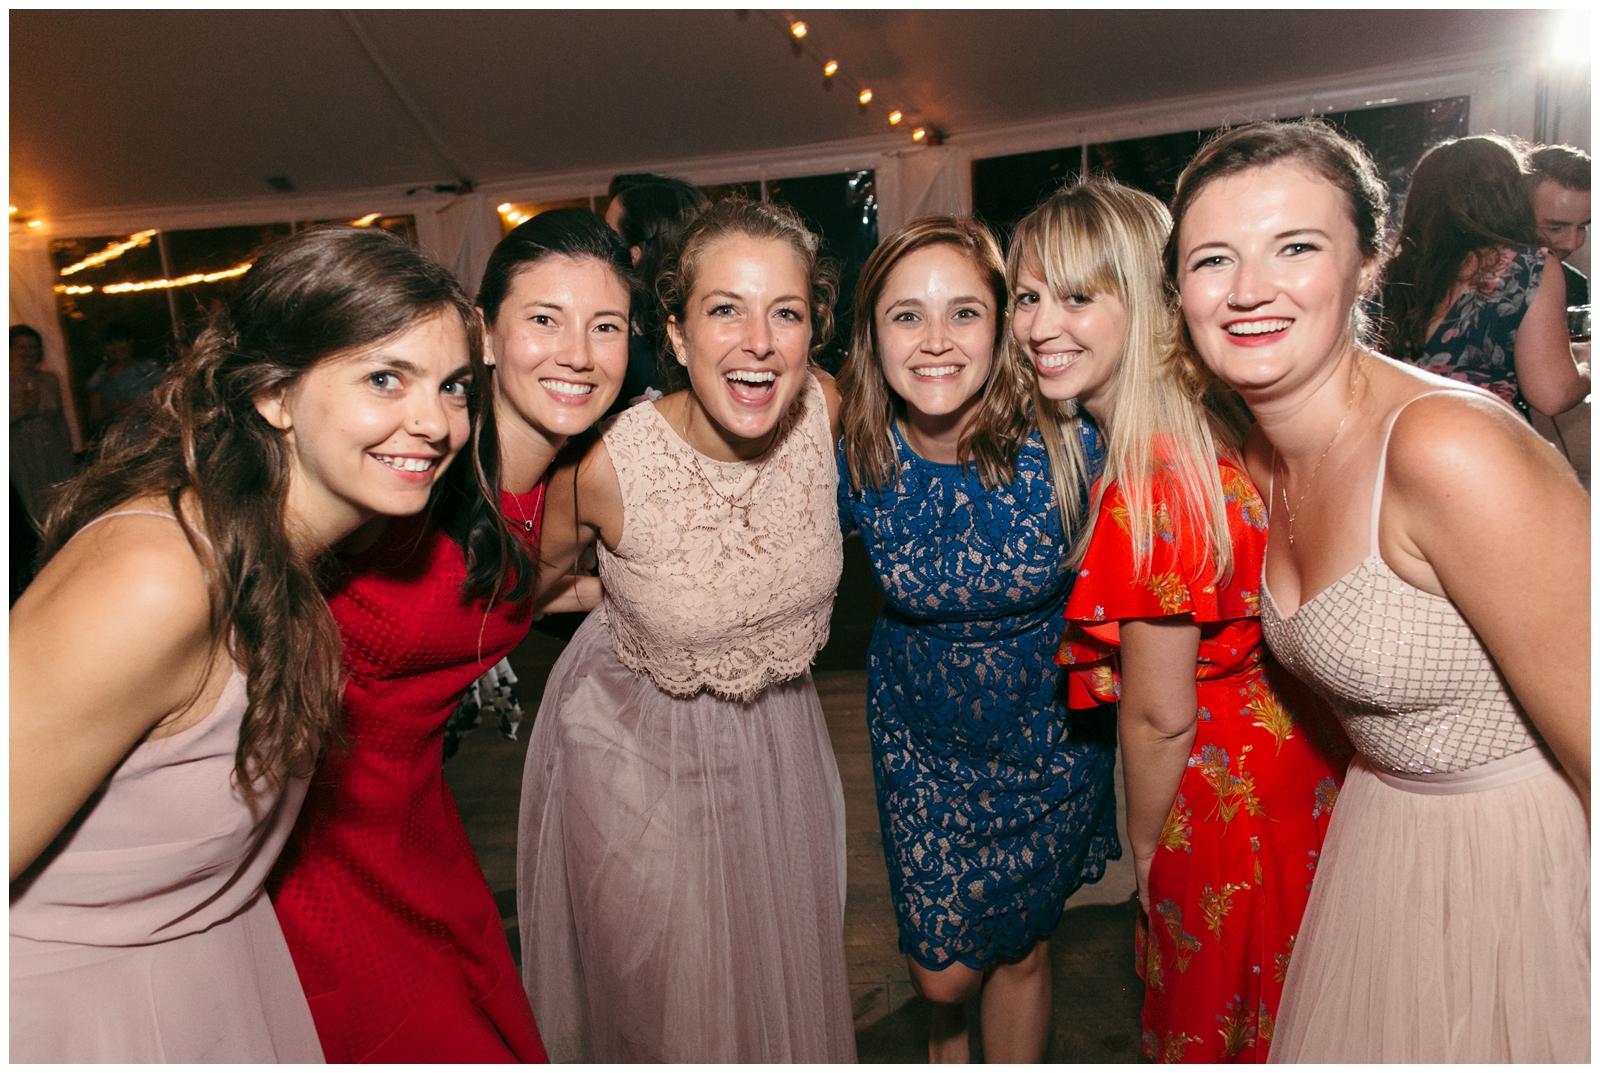 Moraine-Farm-wedding-Bailey-Q-Photo-Massachusetts-wedding-photpgrapher-171.jpg